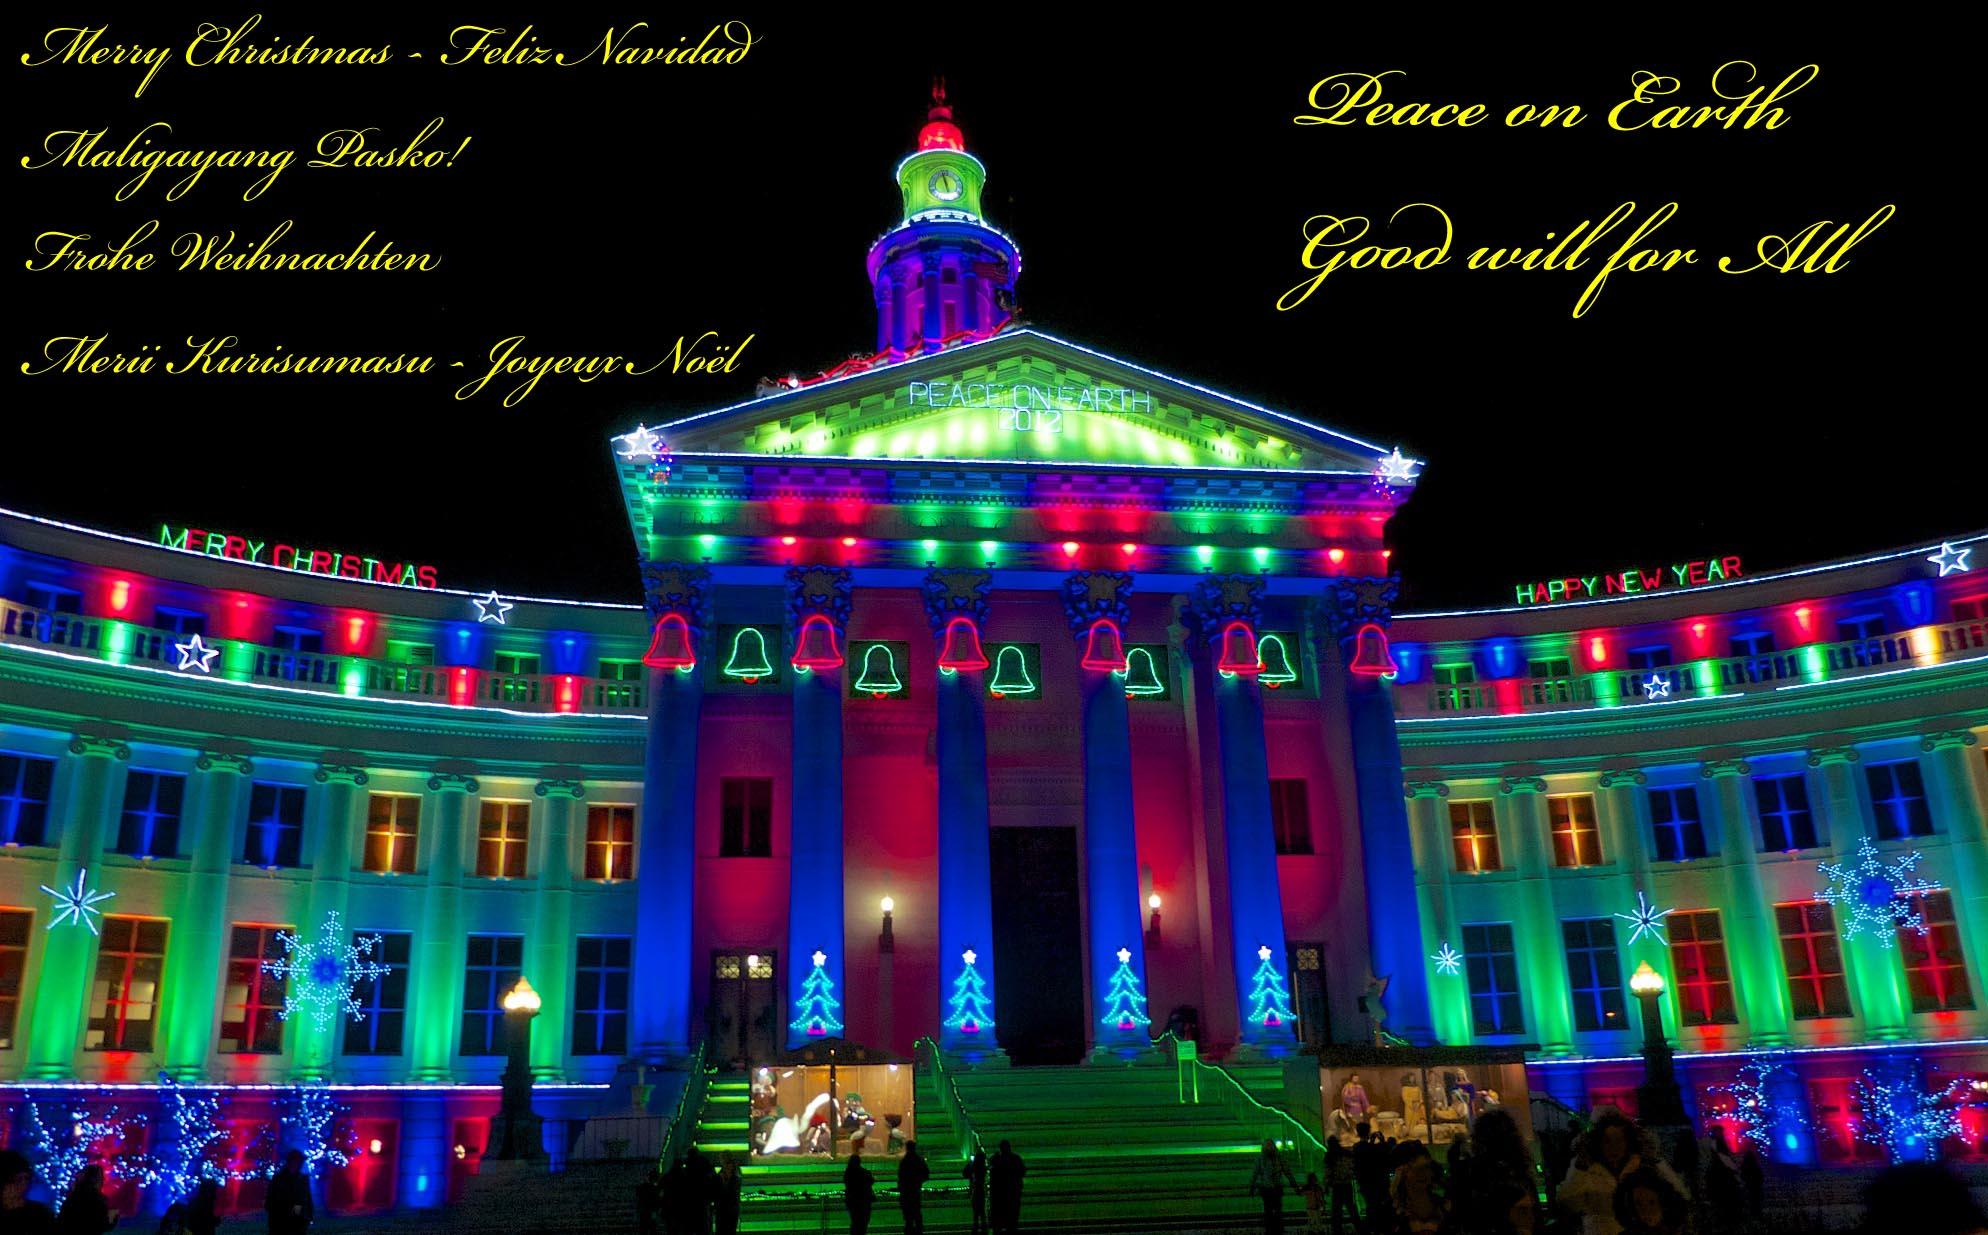 2012 Christmas Lights, Denver Civic Center Building.